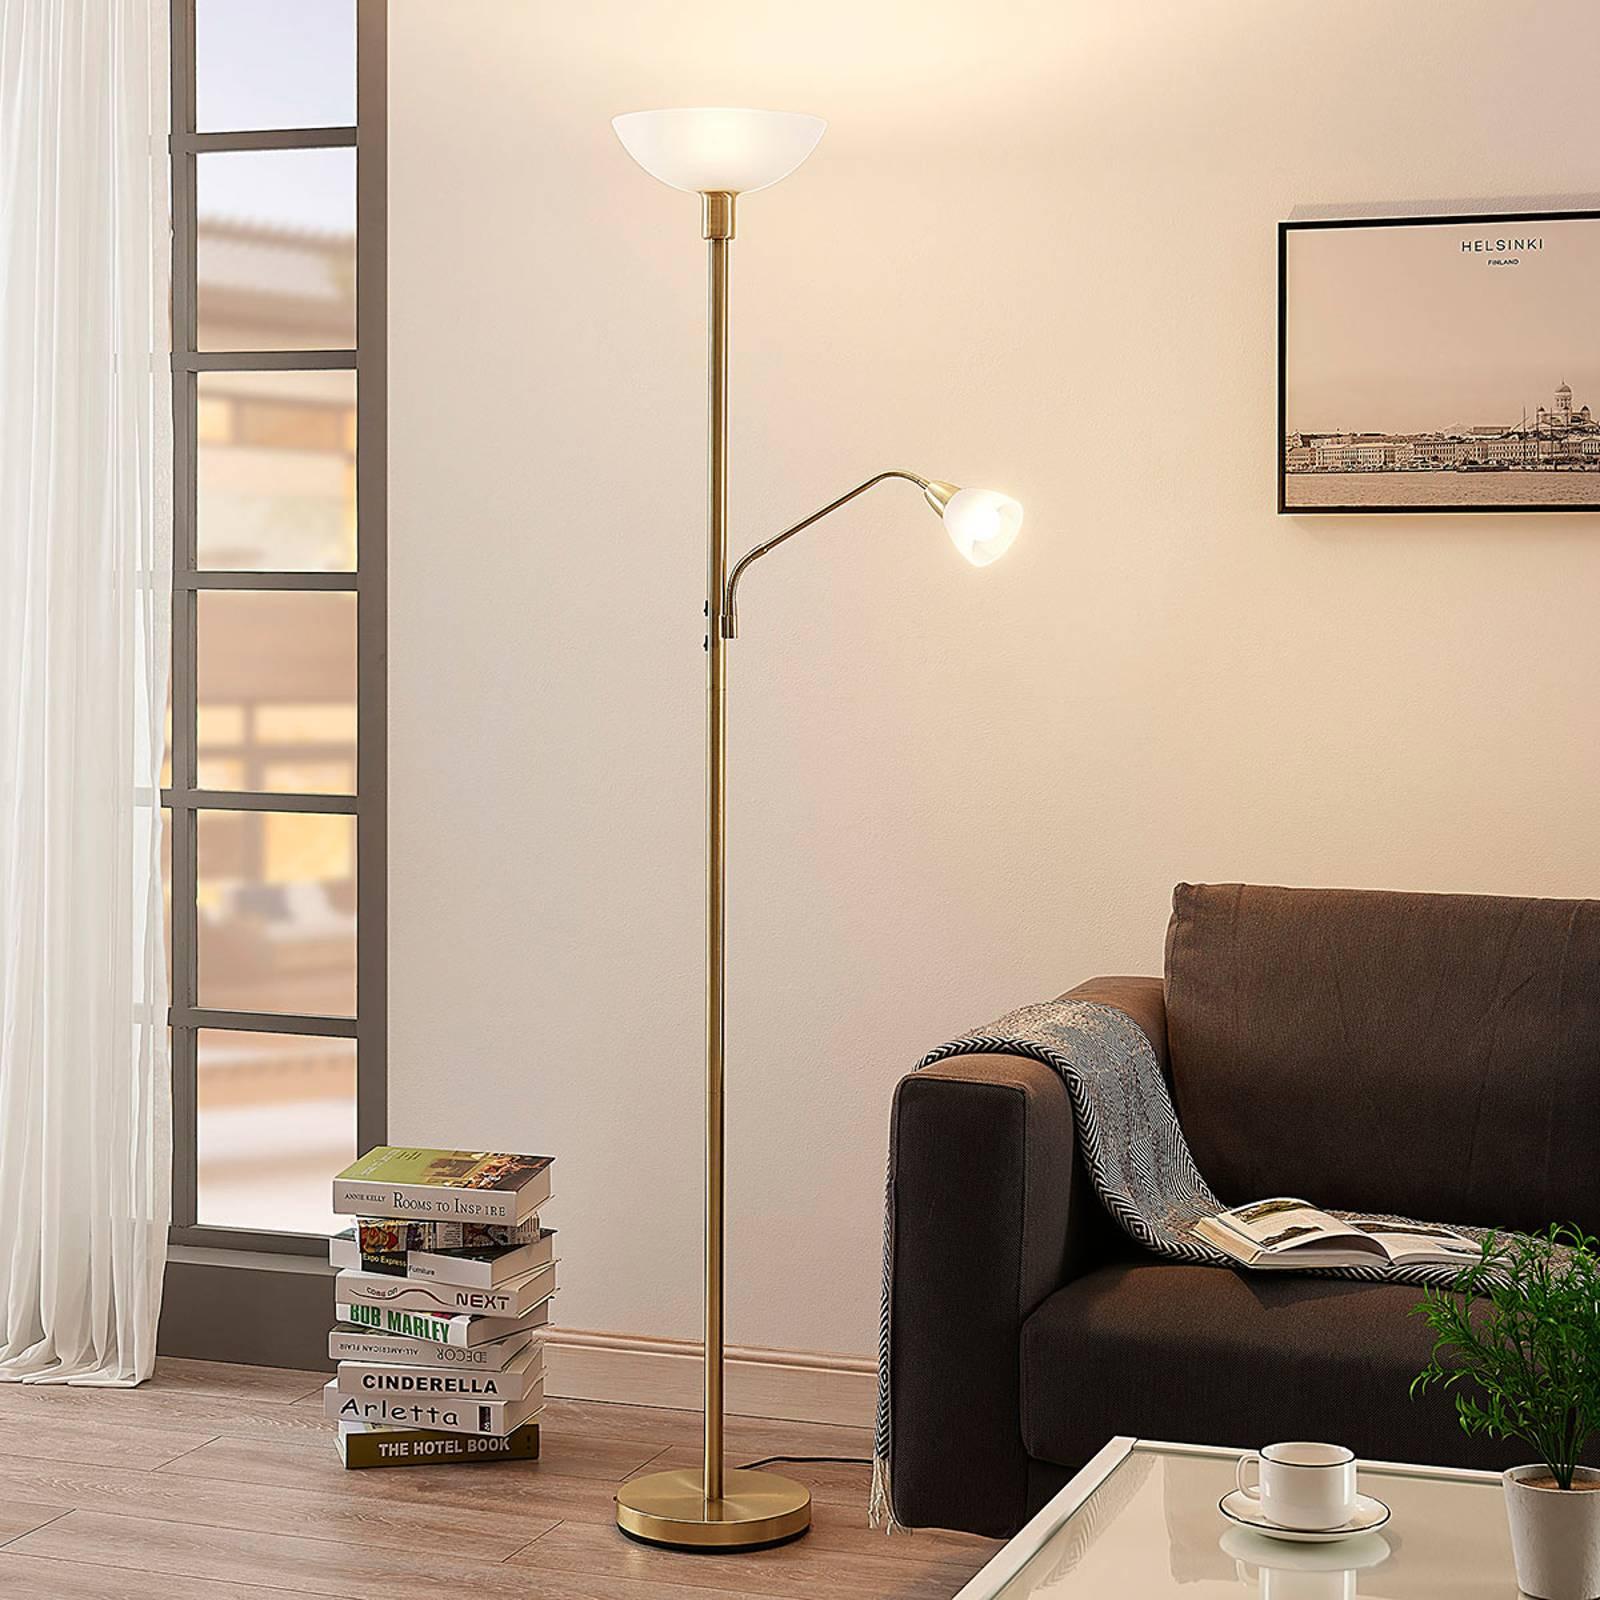 LED-kattovalaisin Jost, lukulamppu, mattamessinki